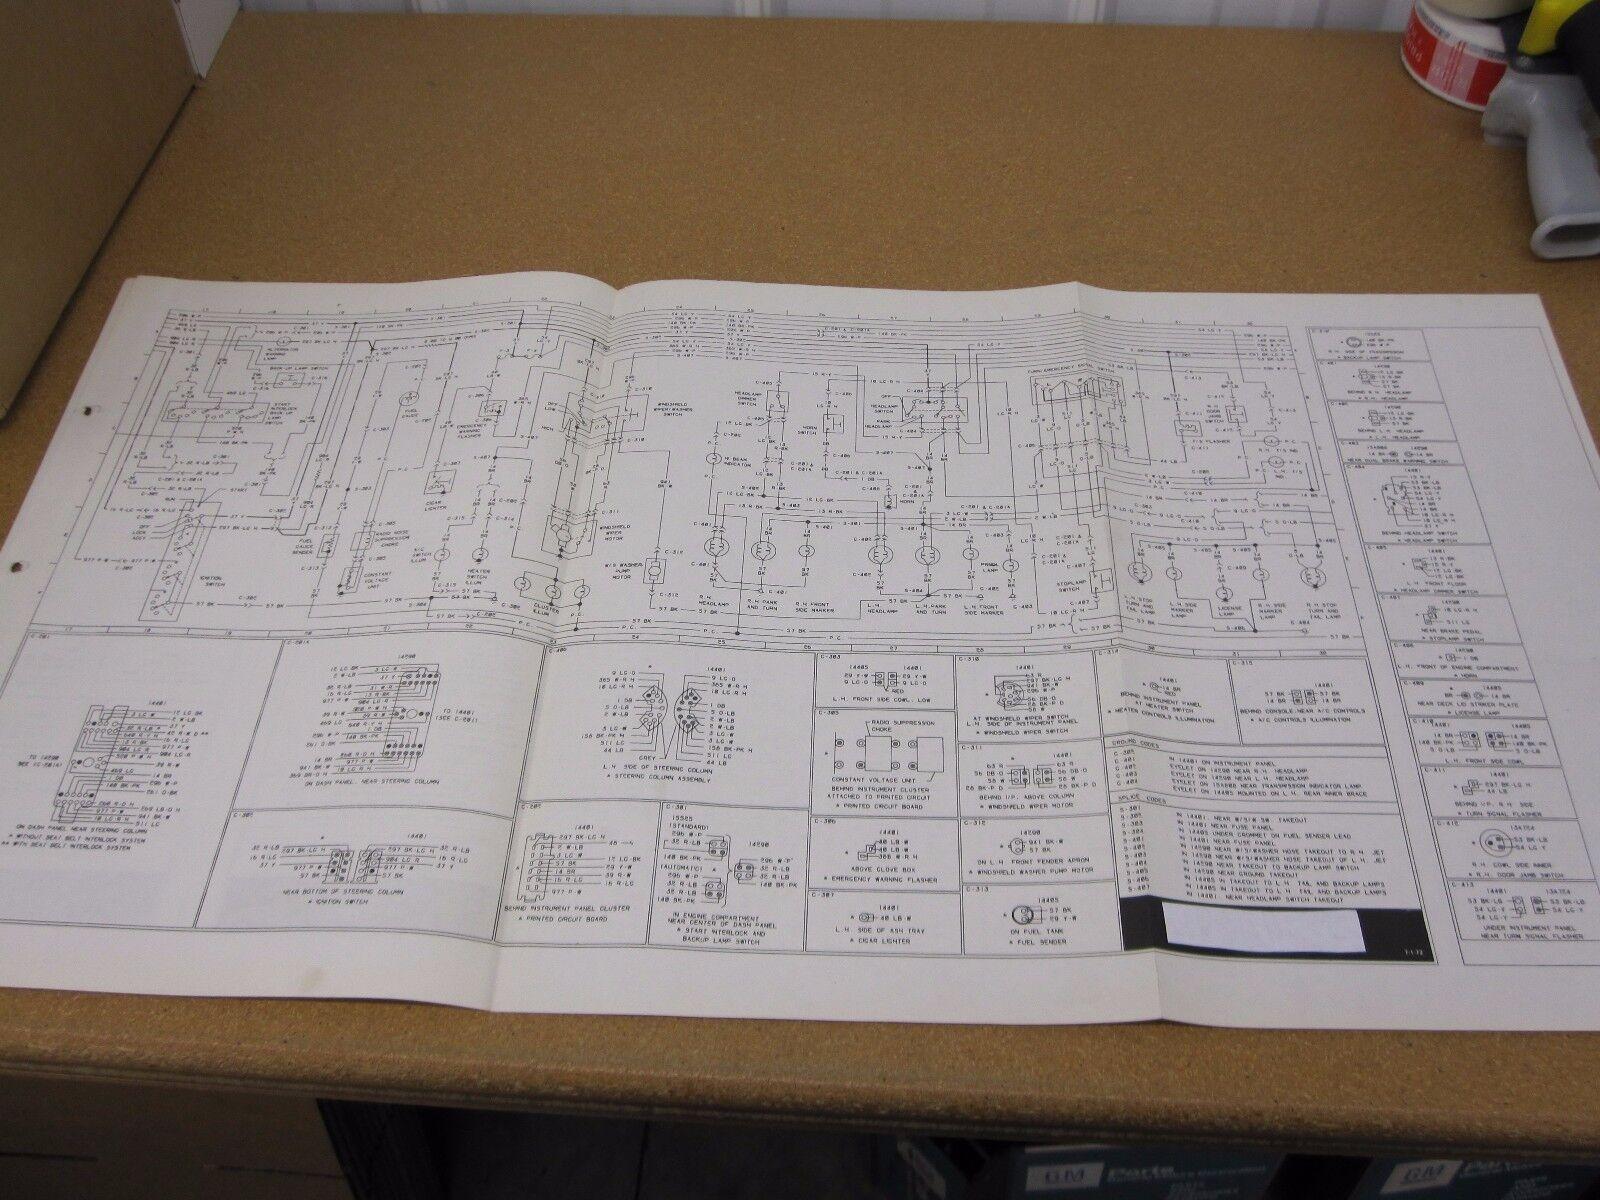 ORIGINAL 1973 Ford Maverick wiring diagram SHEET schematics service manual  | eBay | Ford Maverick Wiring Diagram |  | eBay